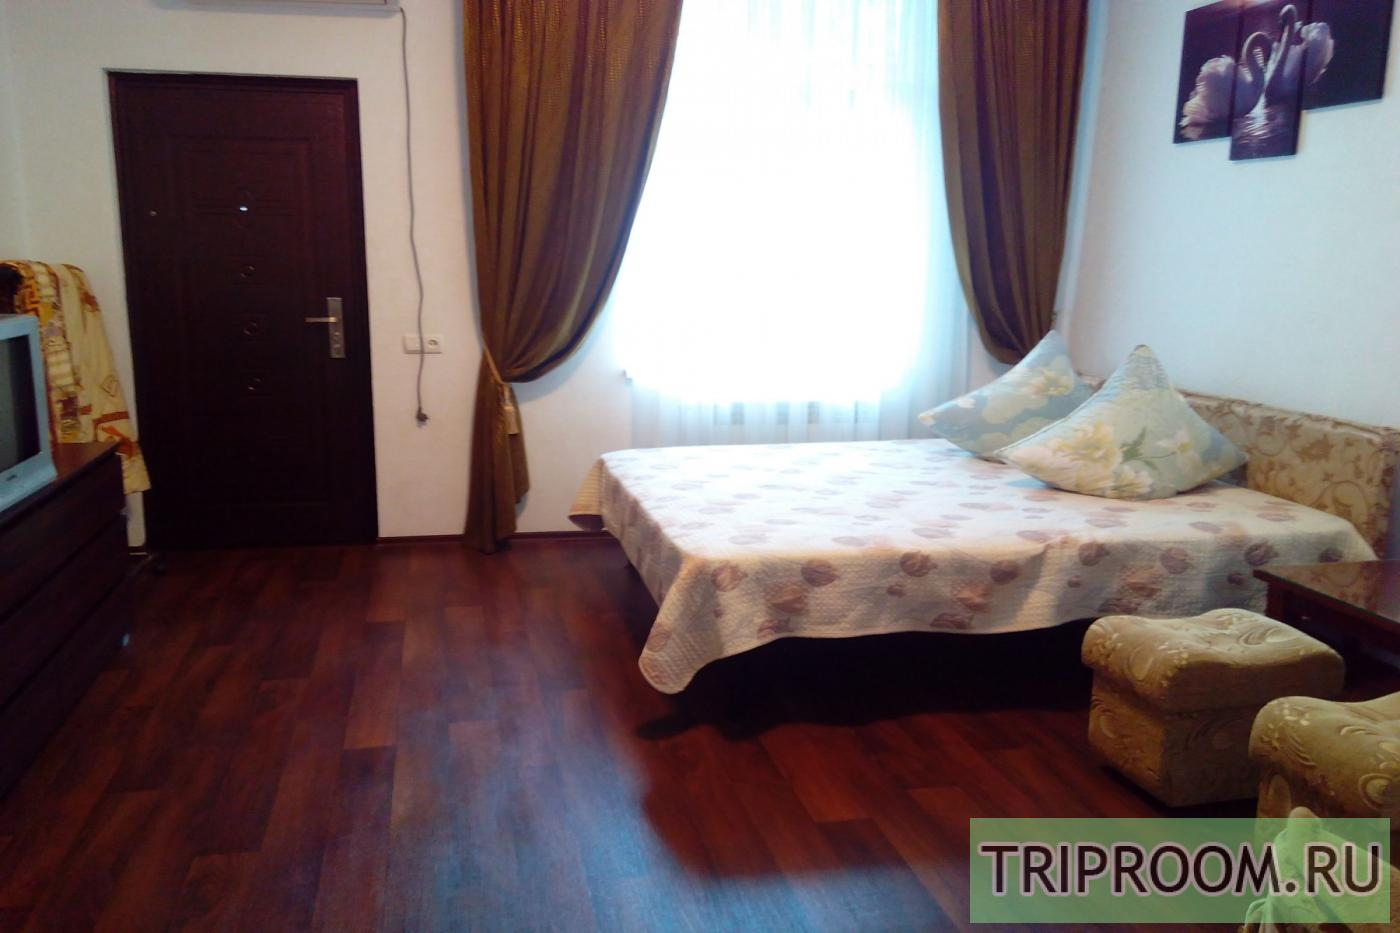 1-комнатная квартира посуточно (вариант № 34422), ул. Ломоносова улица, фото № 1